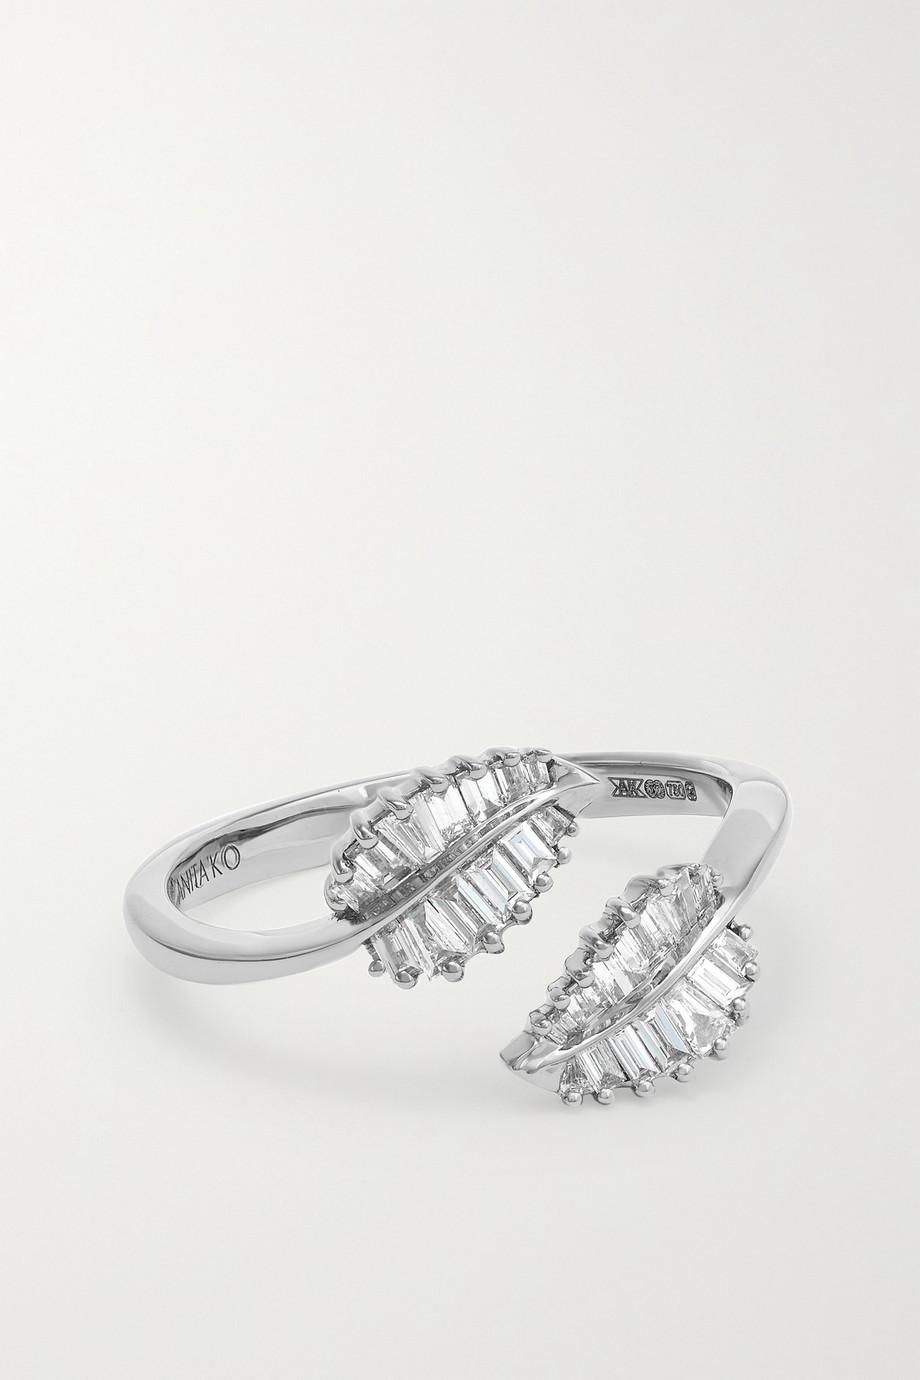 Anita Ko Bague en or blanc 18 carats (750/1000) et diamants Small Palm Leaf